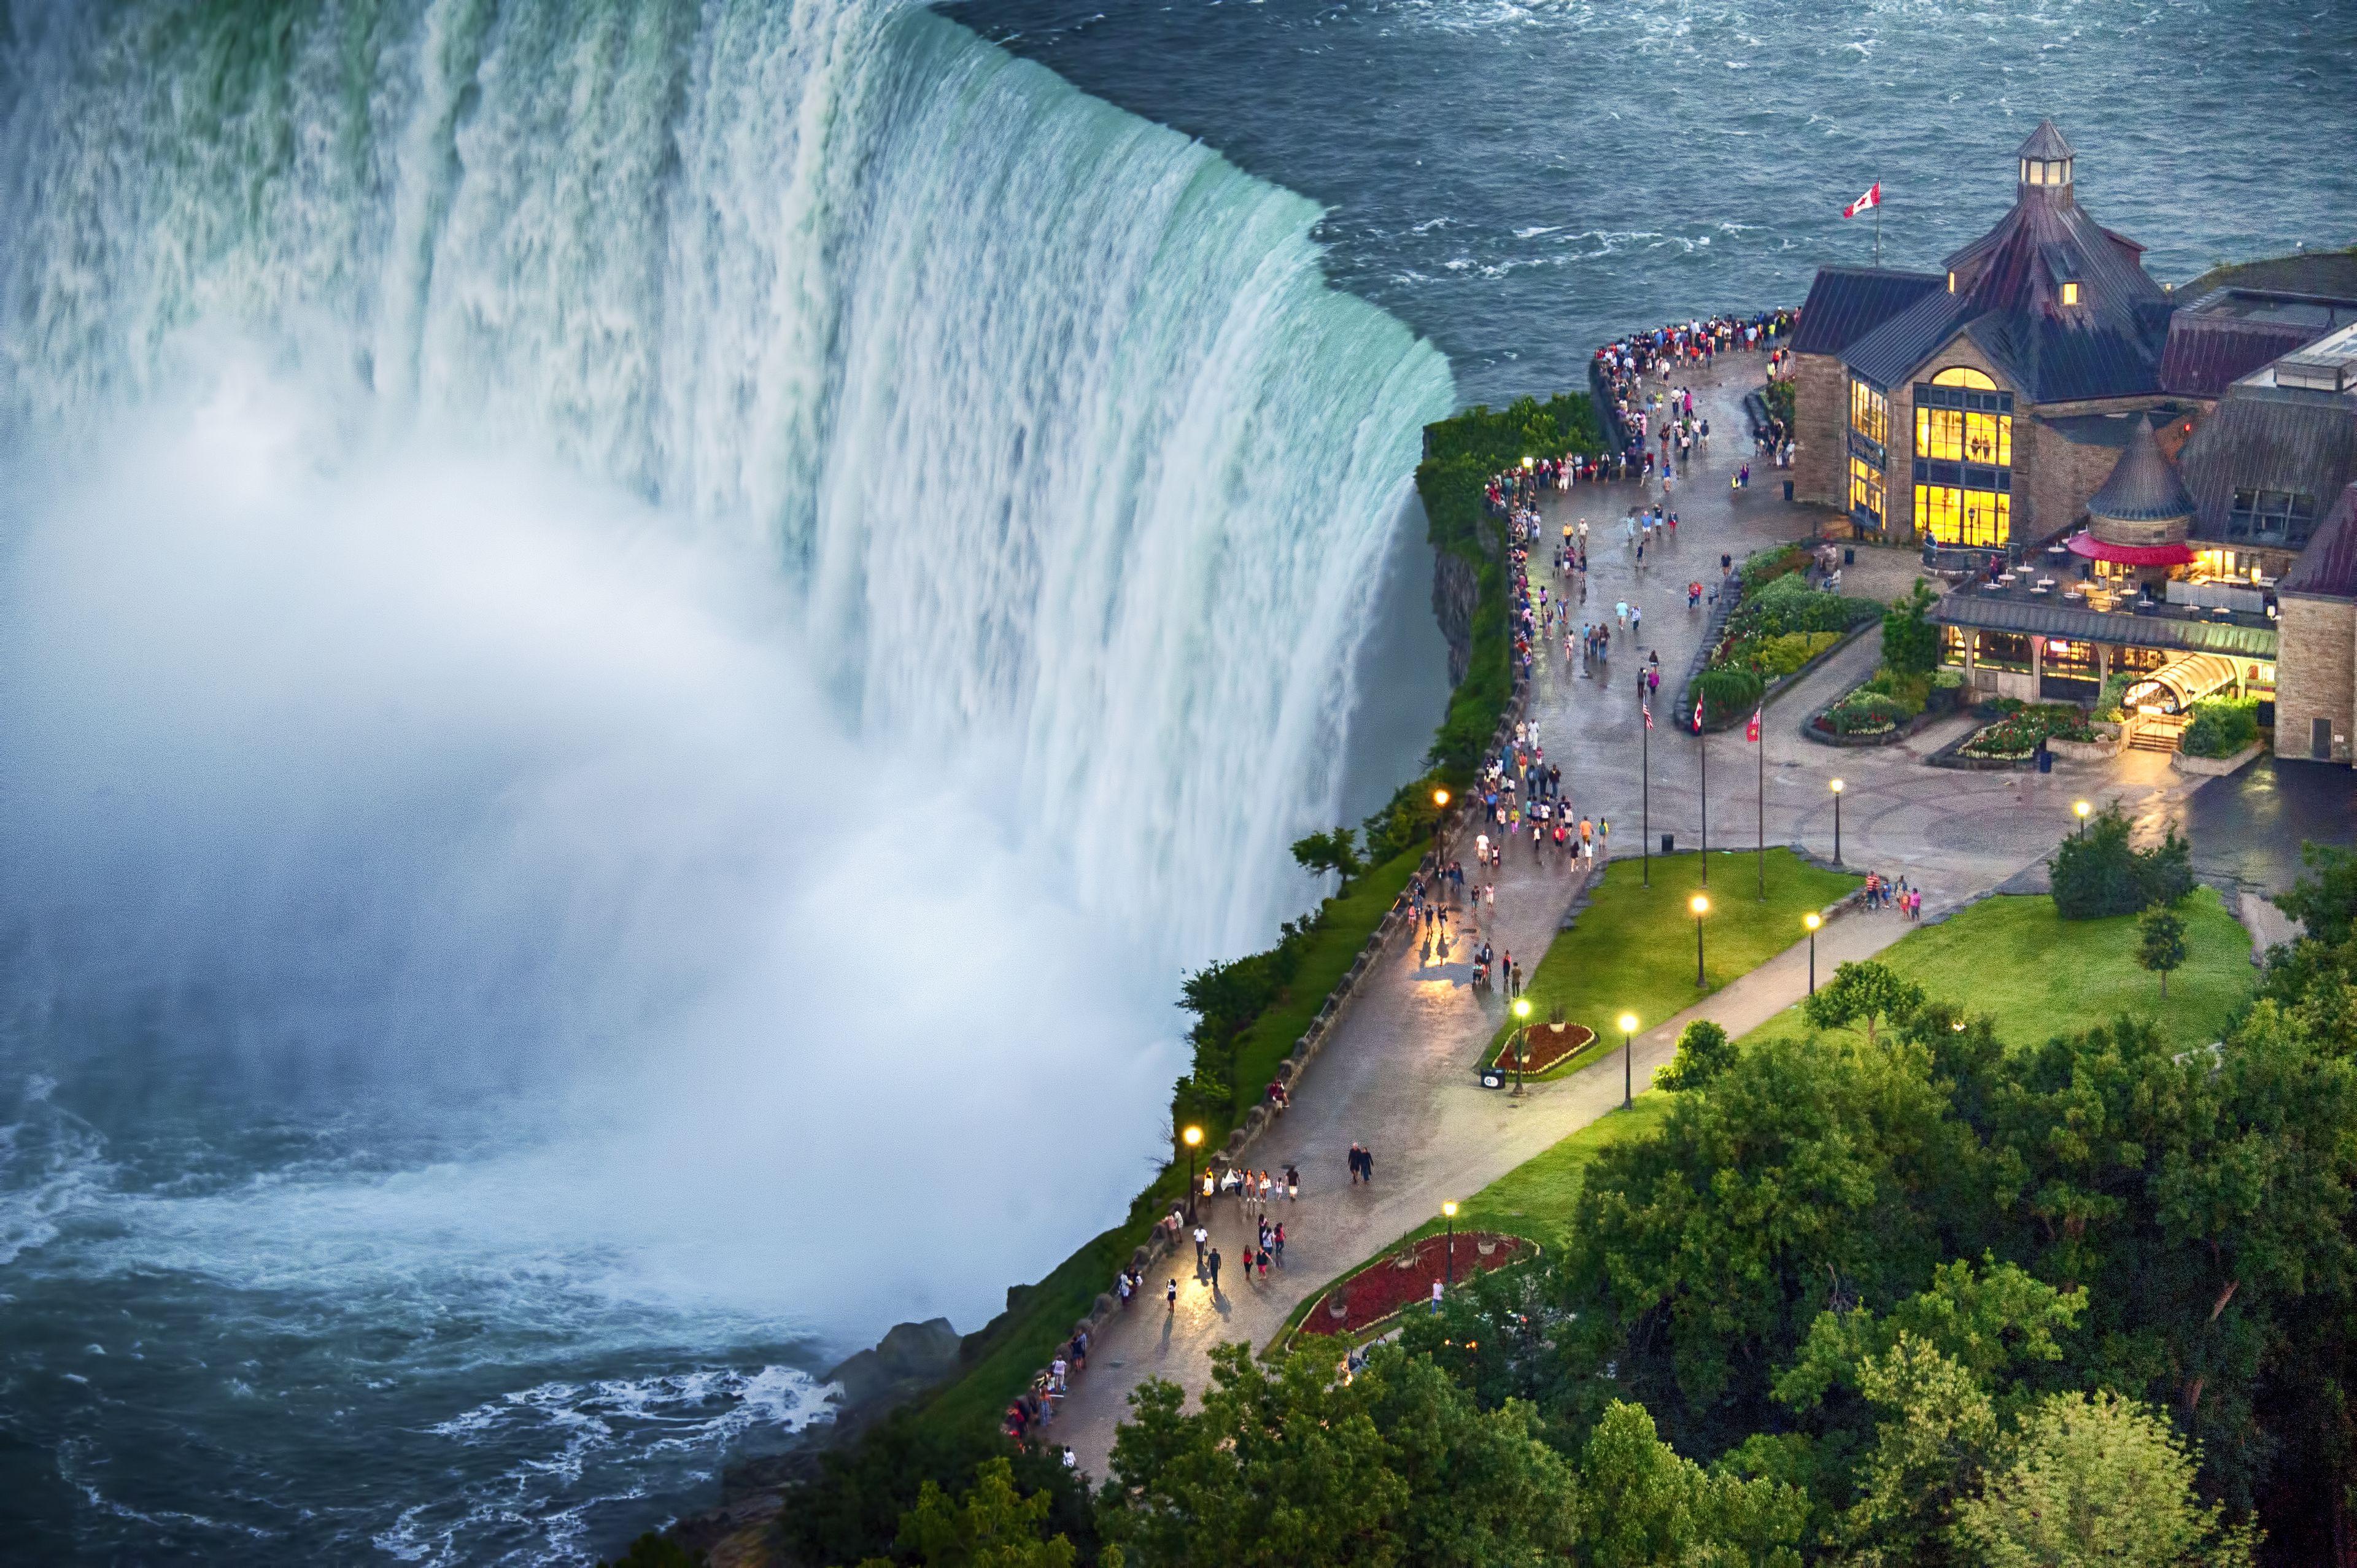 Luxury Coach Tour of Niagara Falls from Toronto